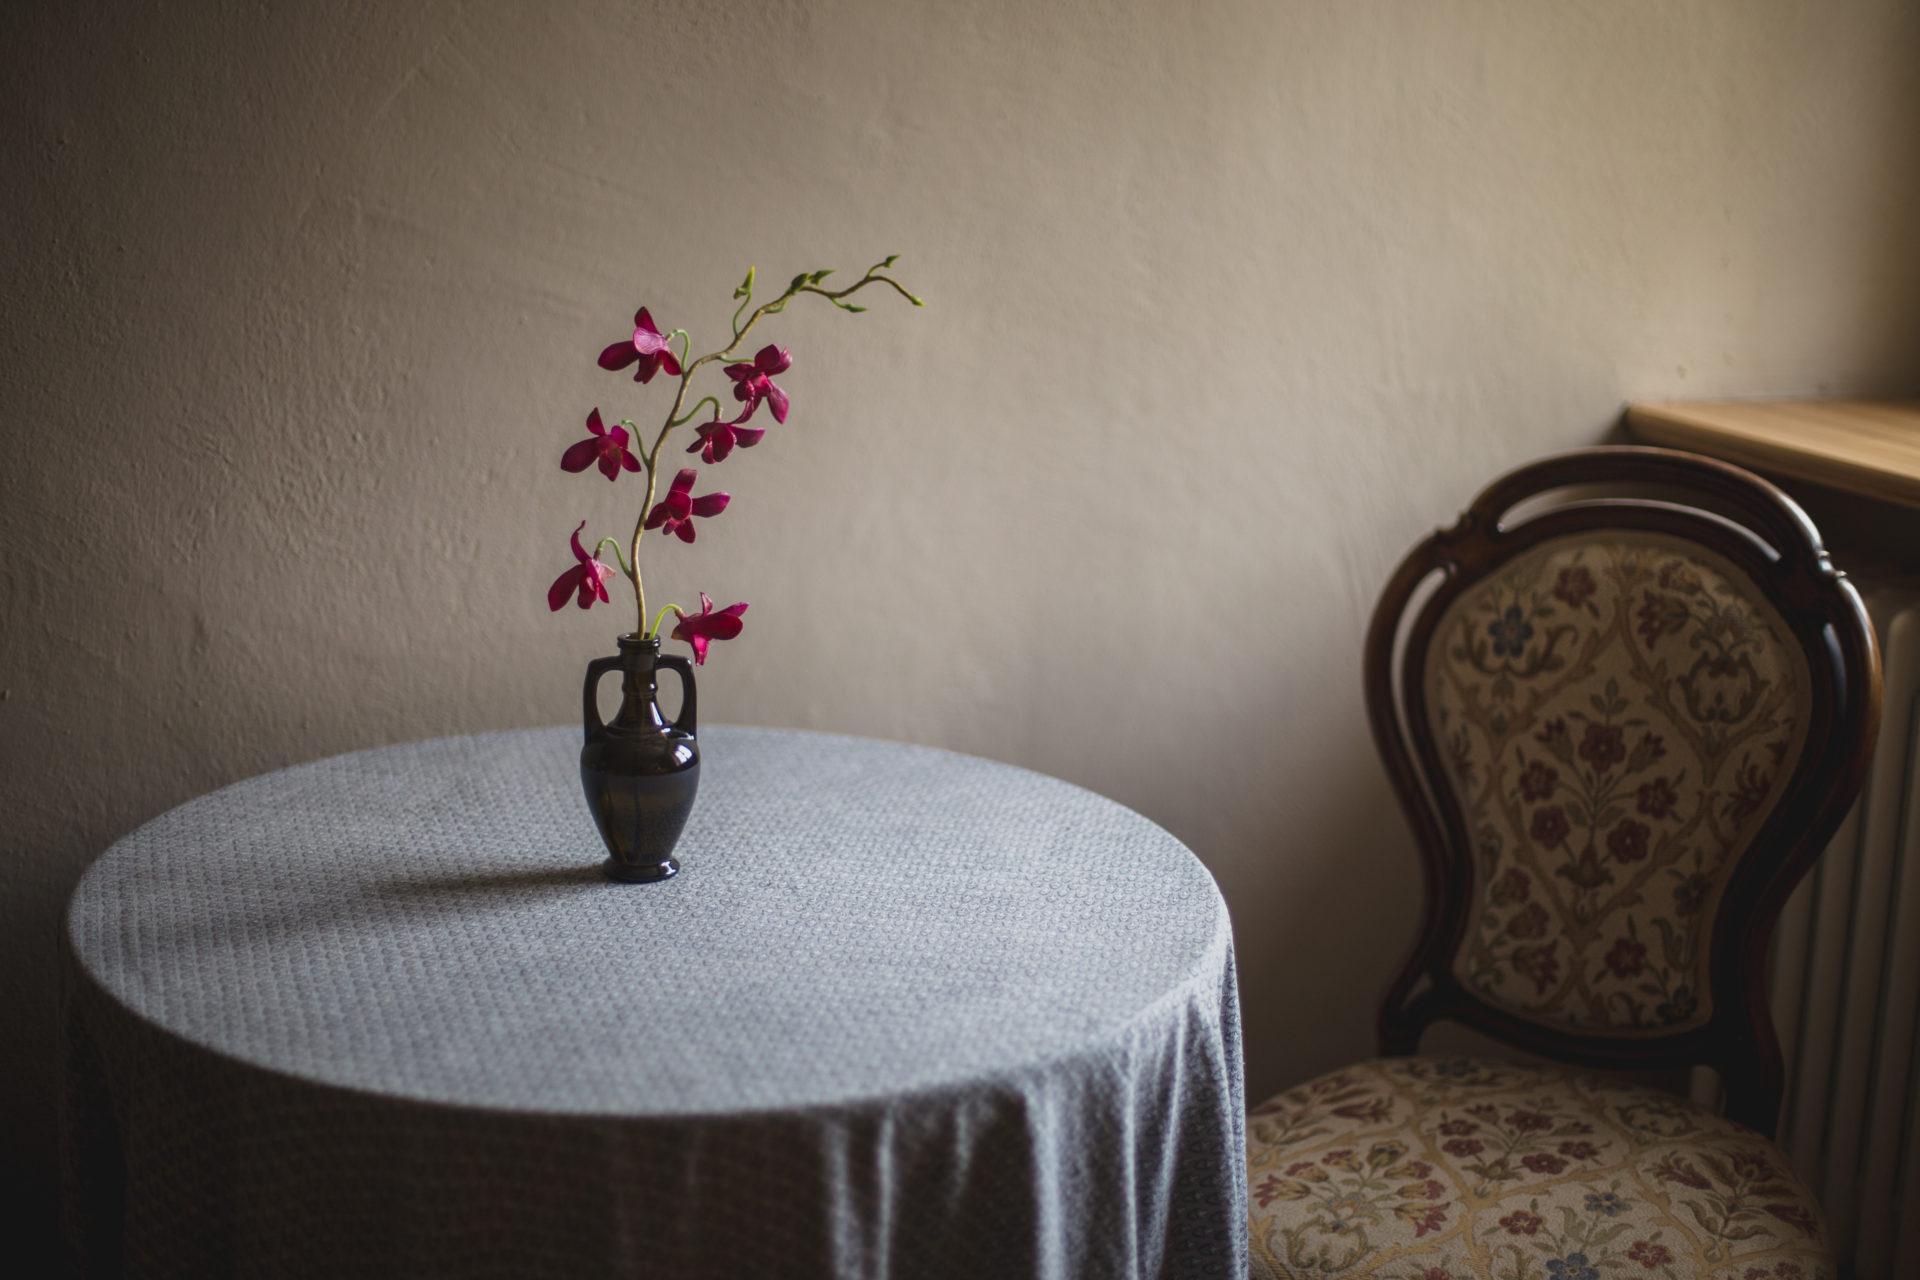 interior-photography_8282_carolin-weinkopf